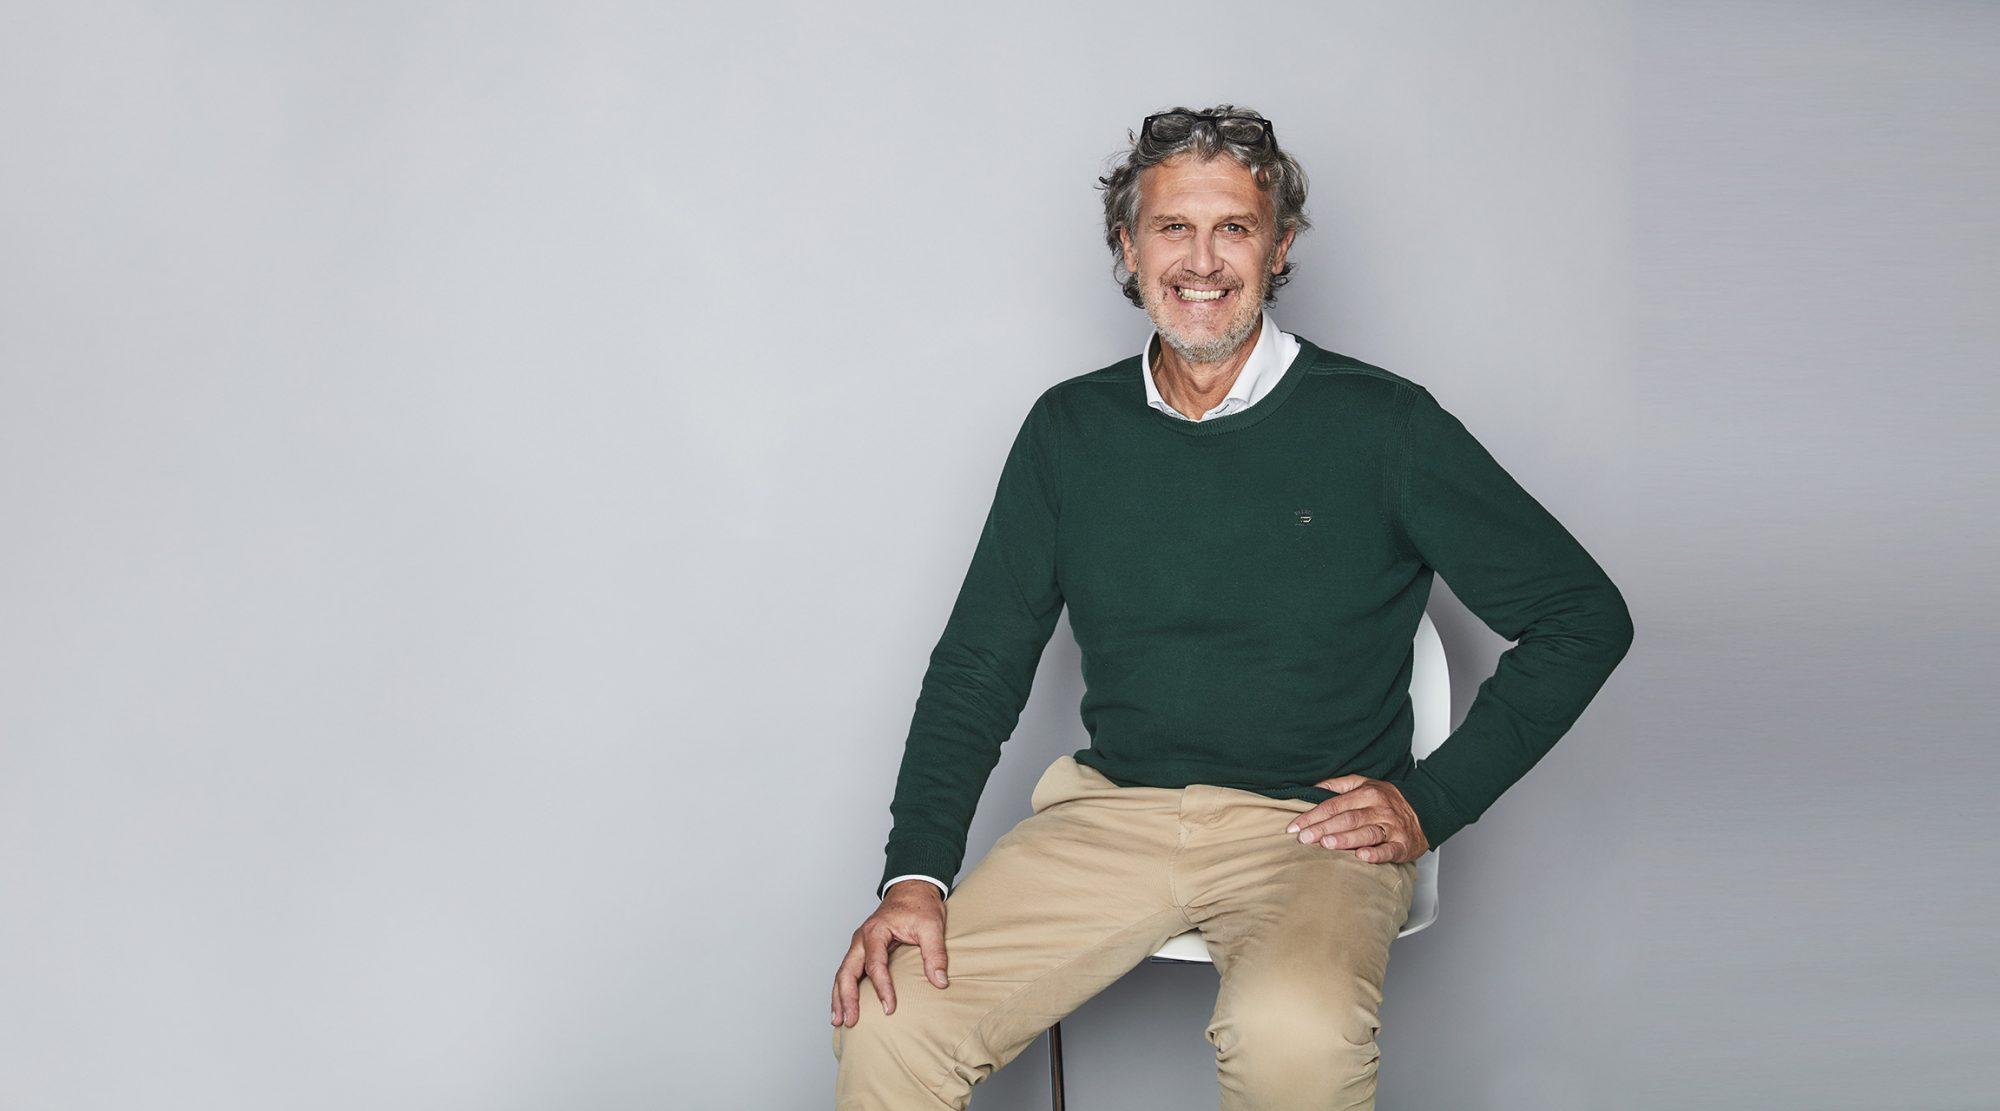 Rob Marcelissen